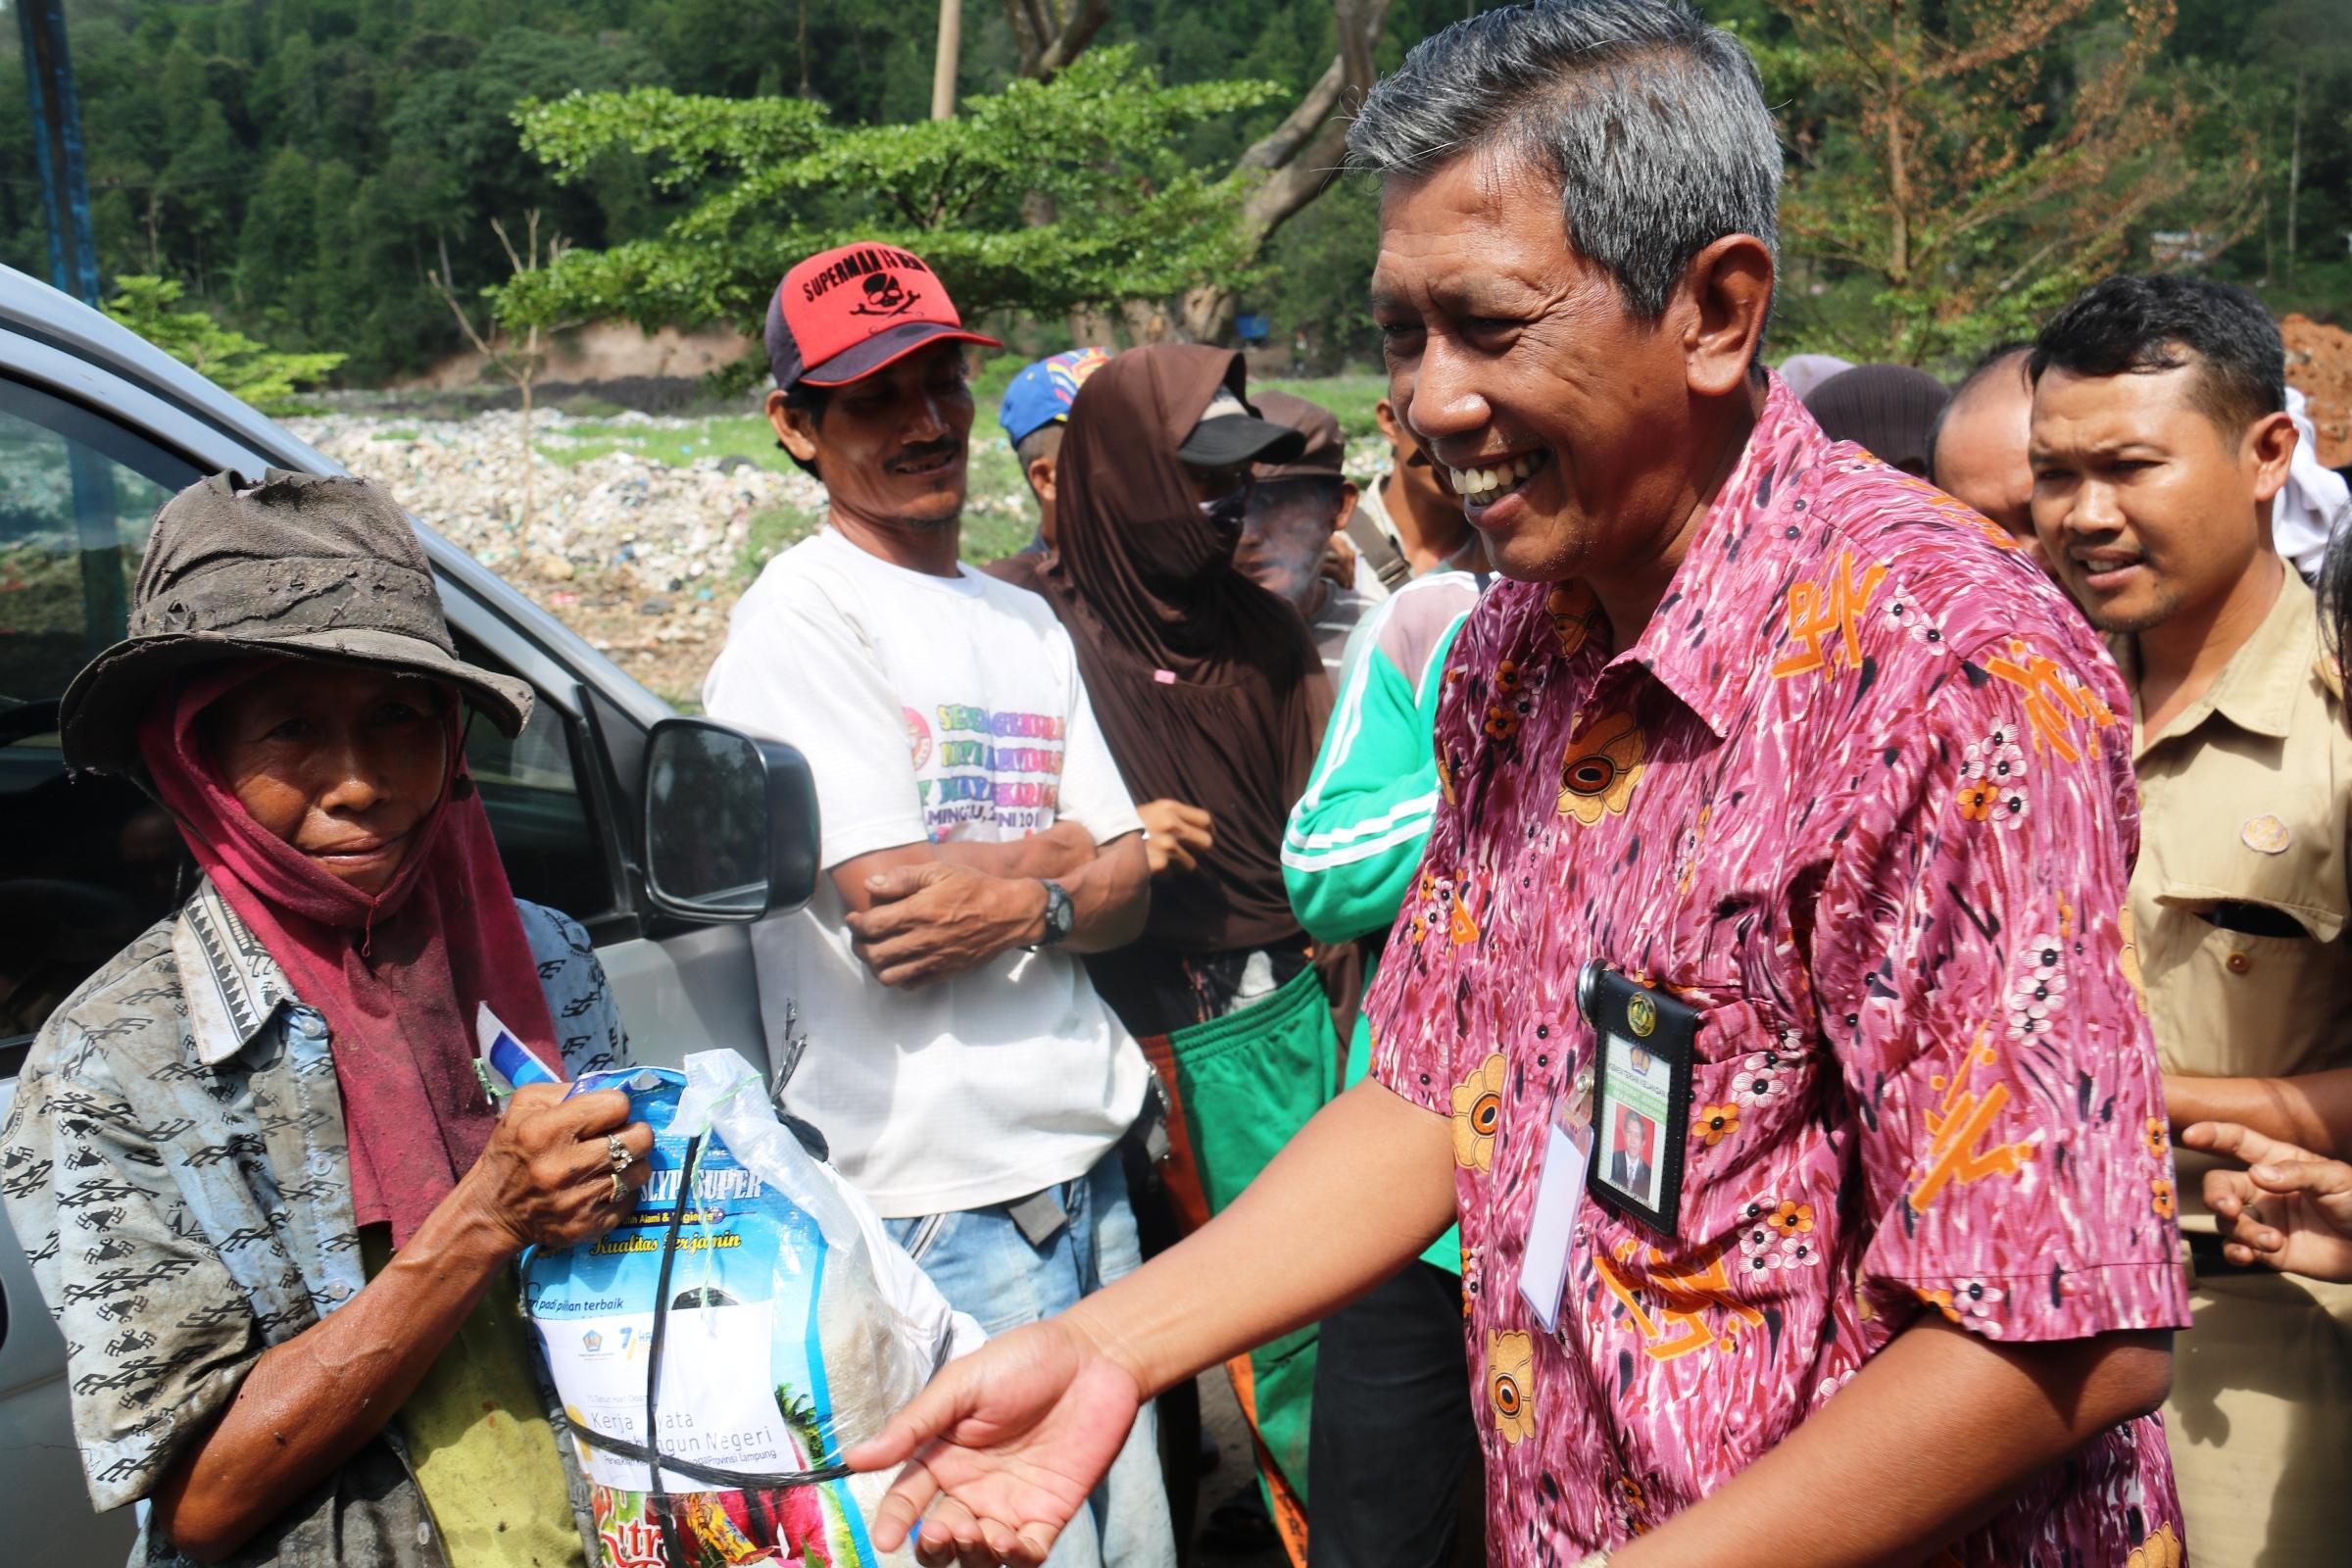 Menyambut Hari Oeang ke-71, Kanwil Lampung Dan Bengkulu Lakukan Bhakti Sosial